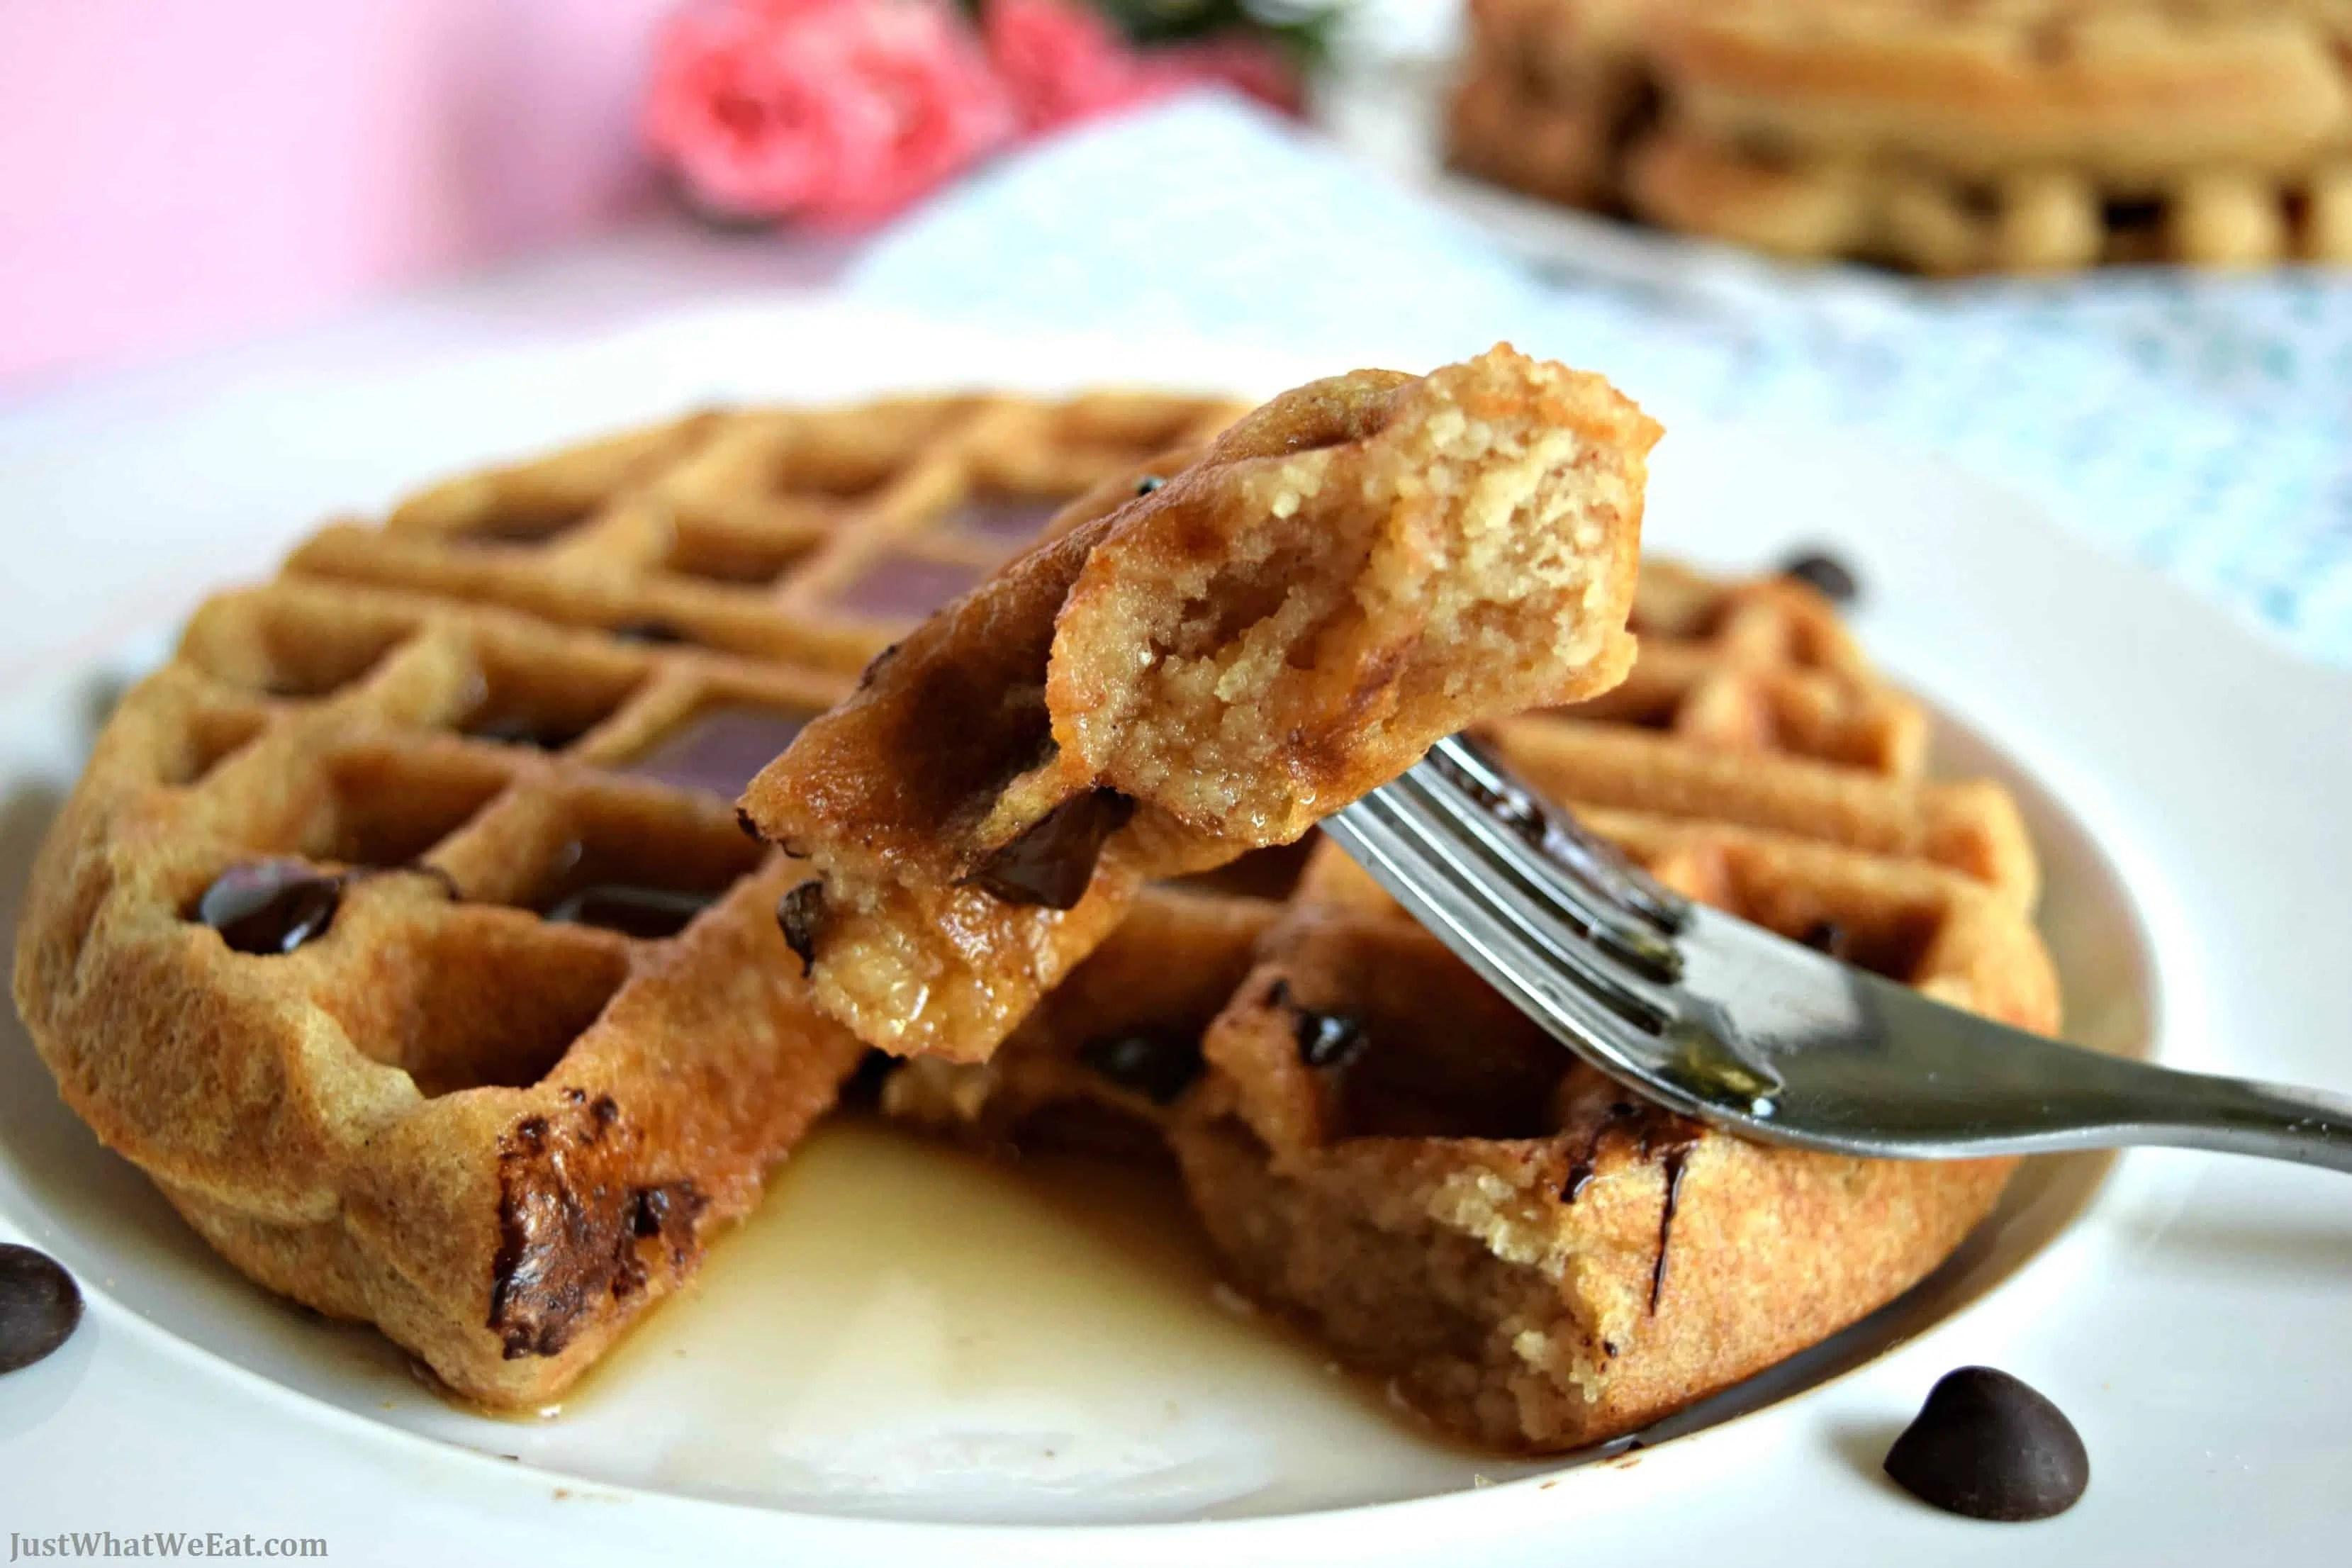 Belgian Waffles - Gluten Free, Vegan, & Refined Sugar Free